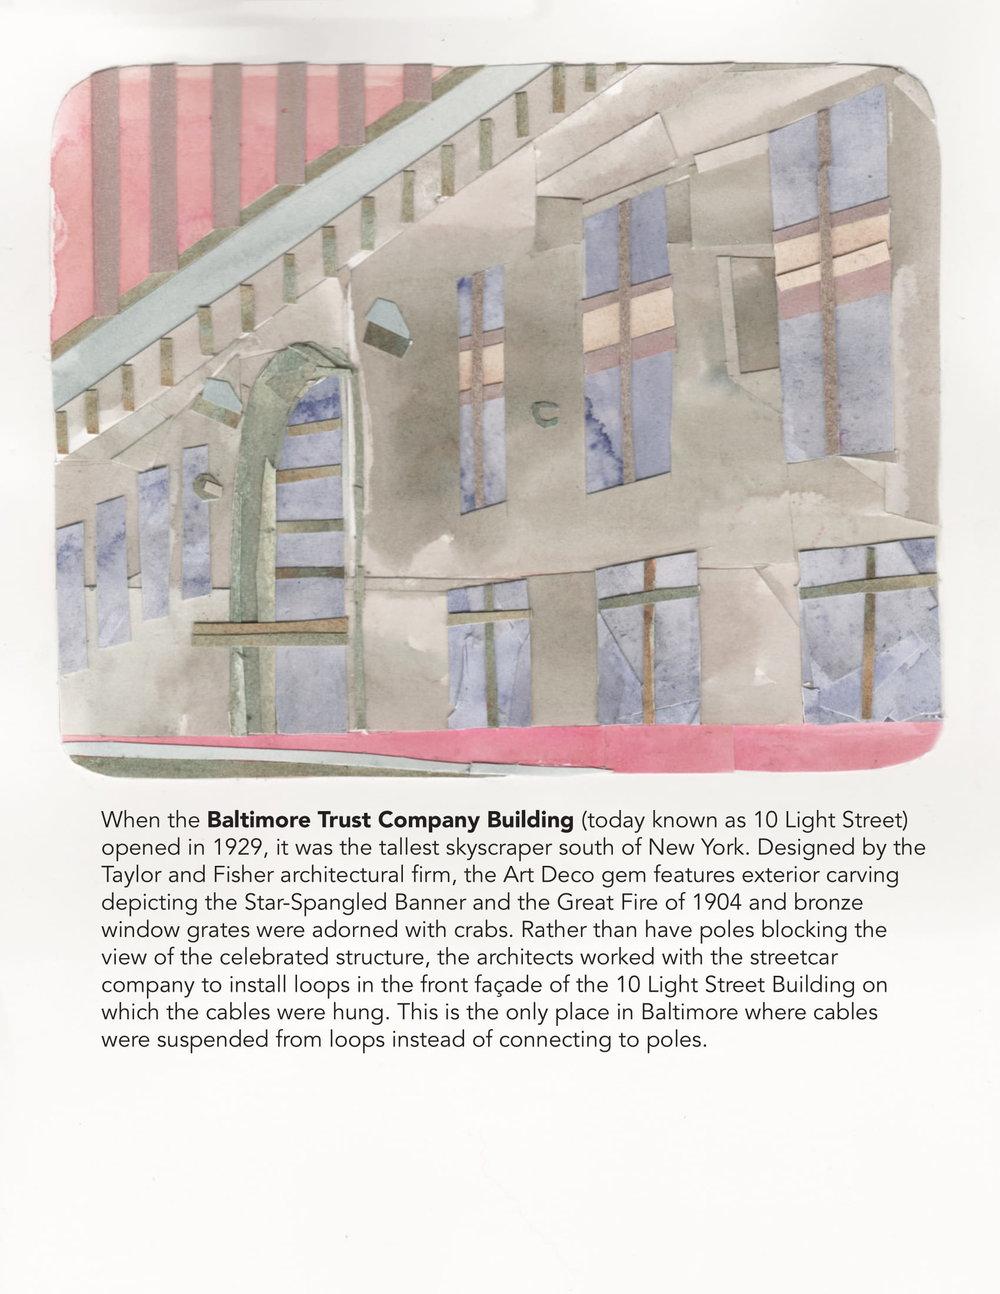 Baltimore Trust Company Building, 2018